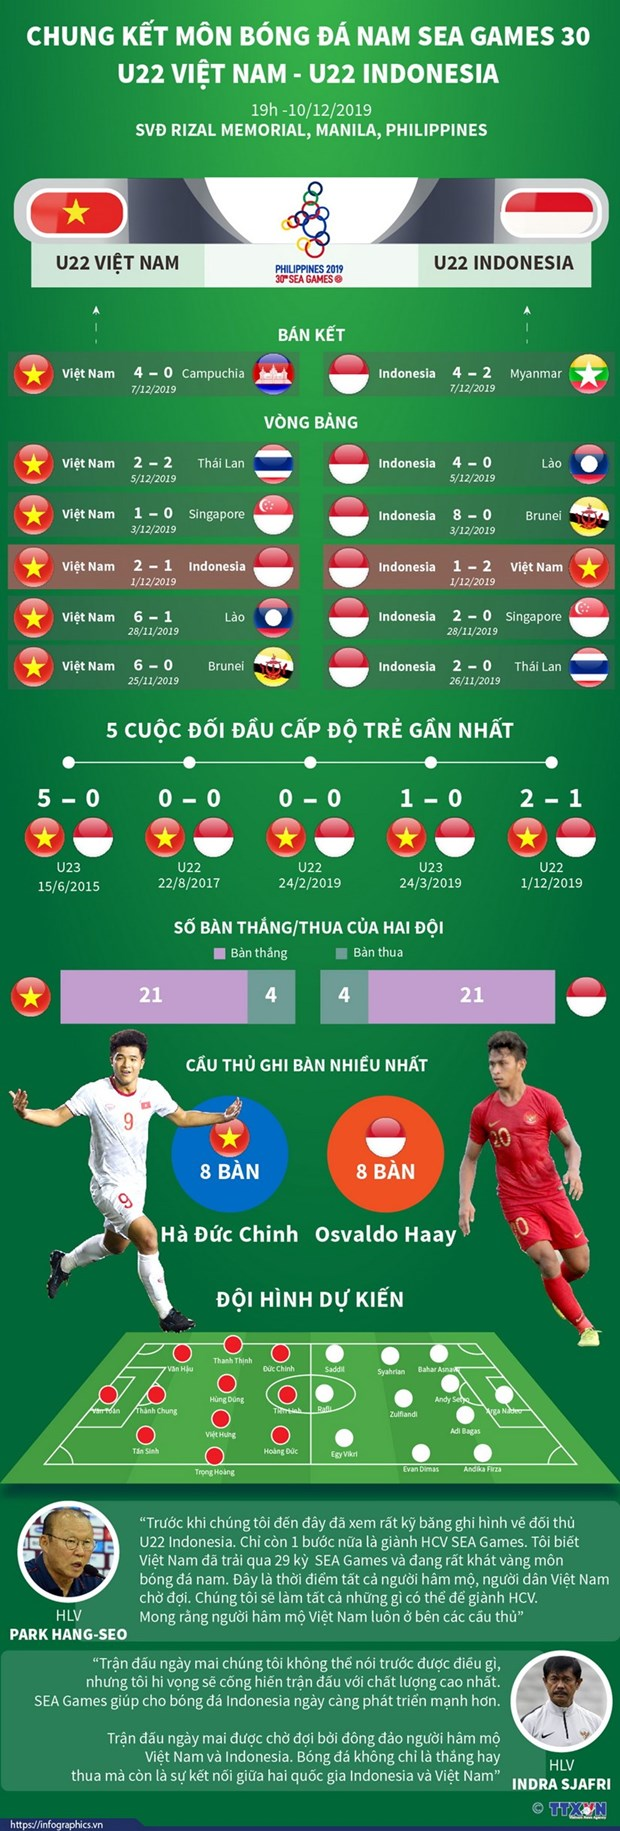 U22 Viet Nam gianh tam huy chuong Vang lich su tai SEA Games hinh anh 1